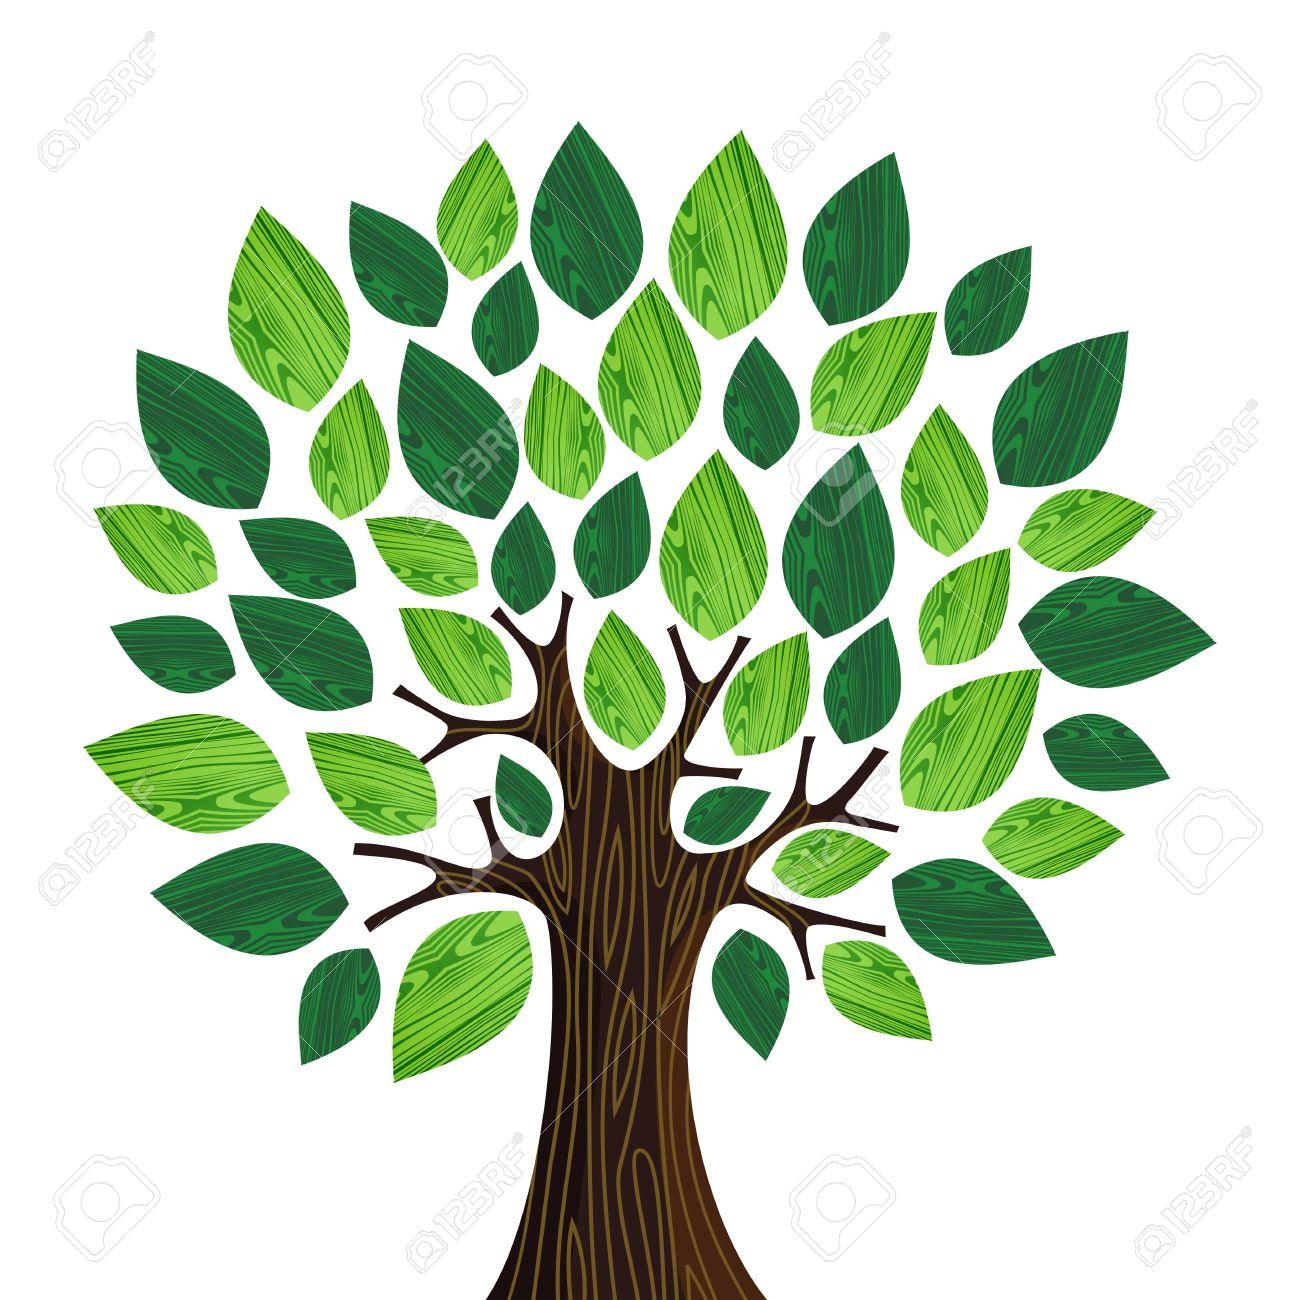 1,551 Tree Unity Stock Vector Illustration And Royalty Free Tree.